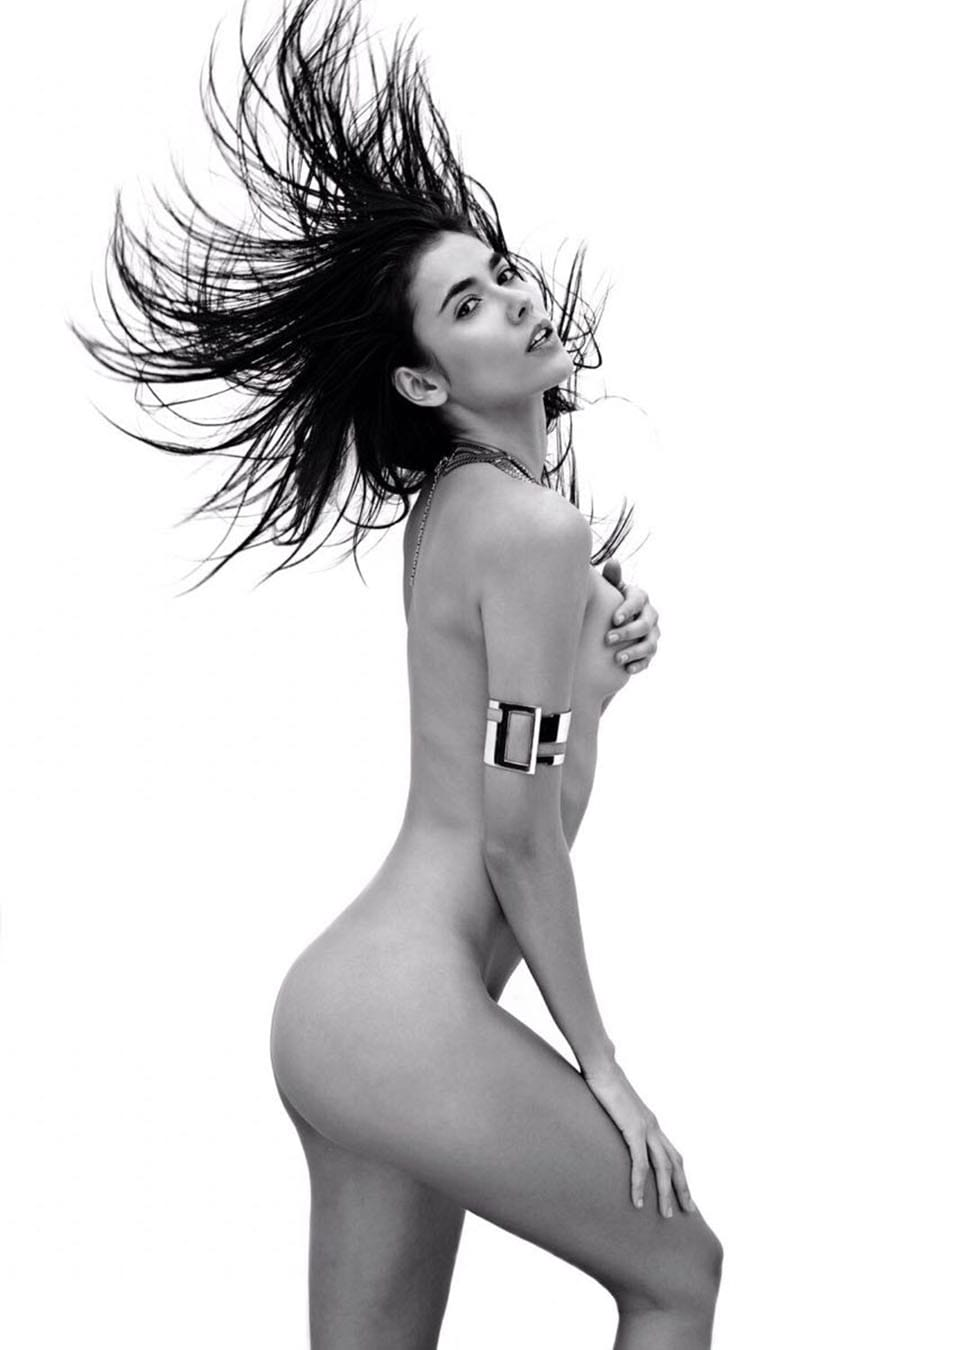 ICloud Marly Velasquez naked (51 photo), Ass, Bikini, Feet, panties 2019